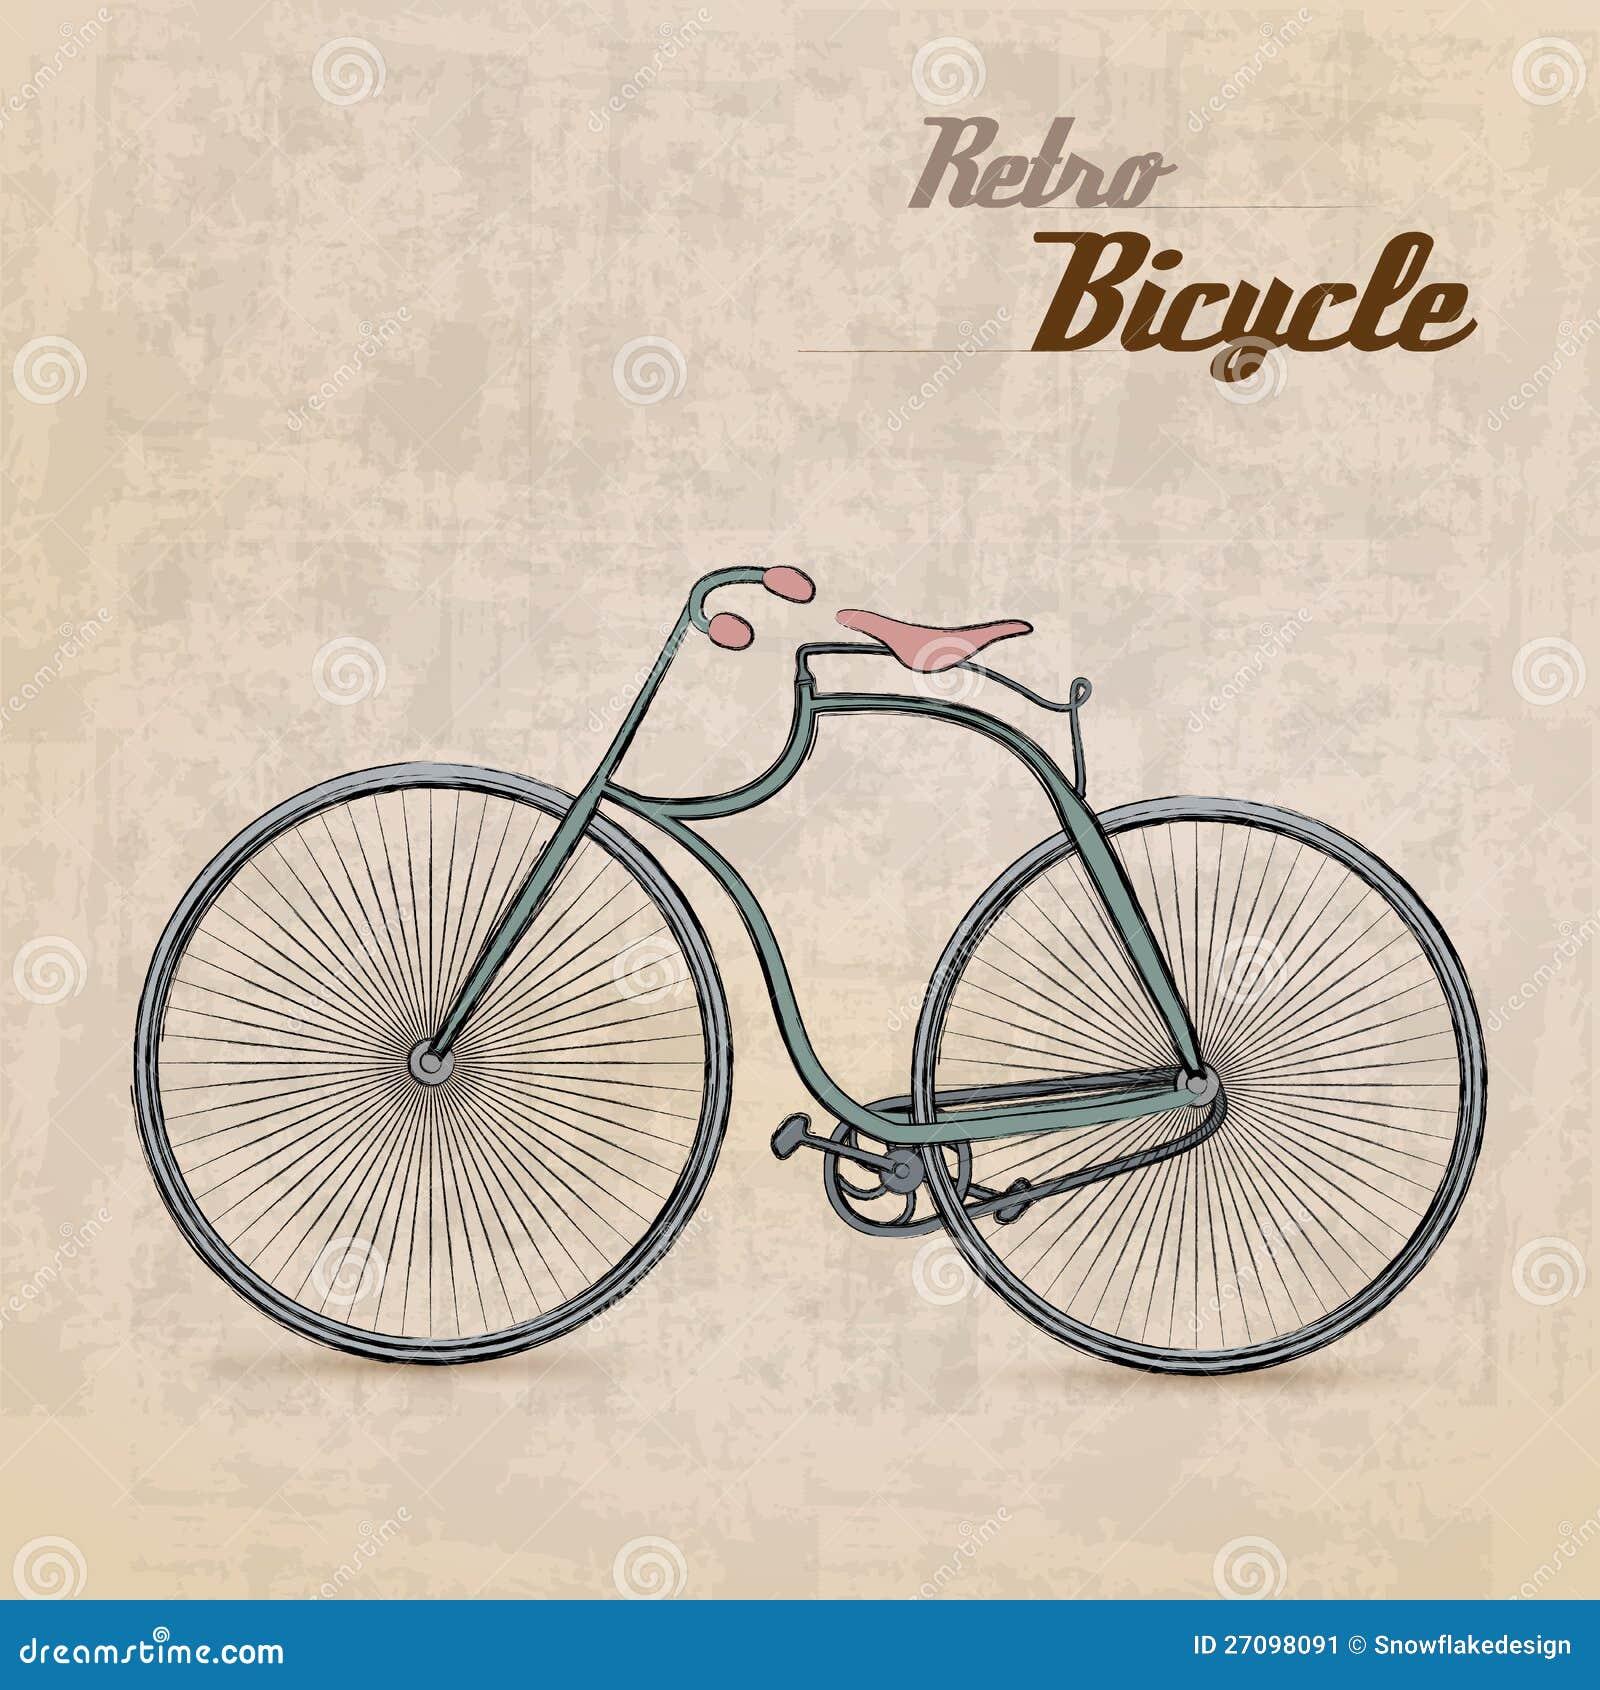 Vintage Retro Bicycle stock vector  Illustration of cyclist - 27098091